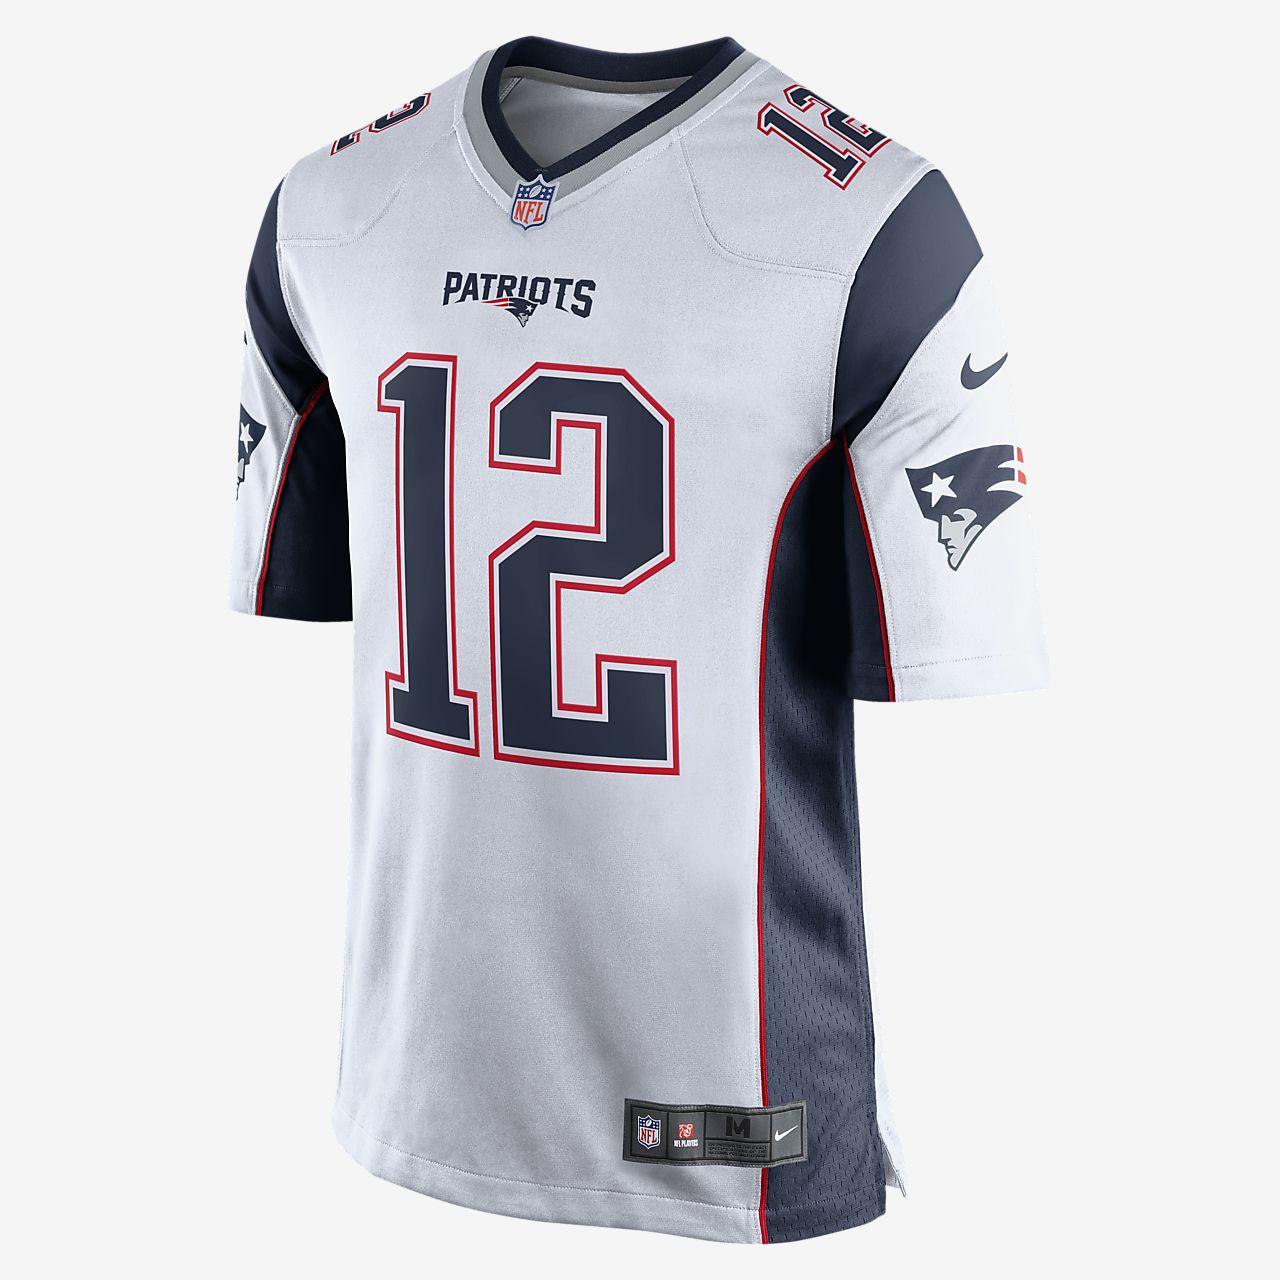 af529cee8d Camiseta oficial de fútbol americano de visitante para hombre de NFL New  England Patriots (Tom